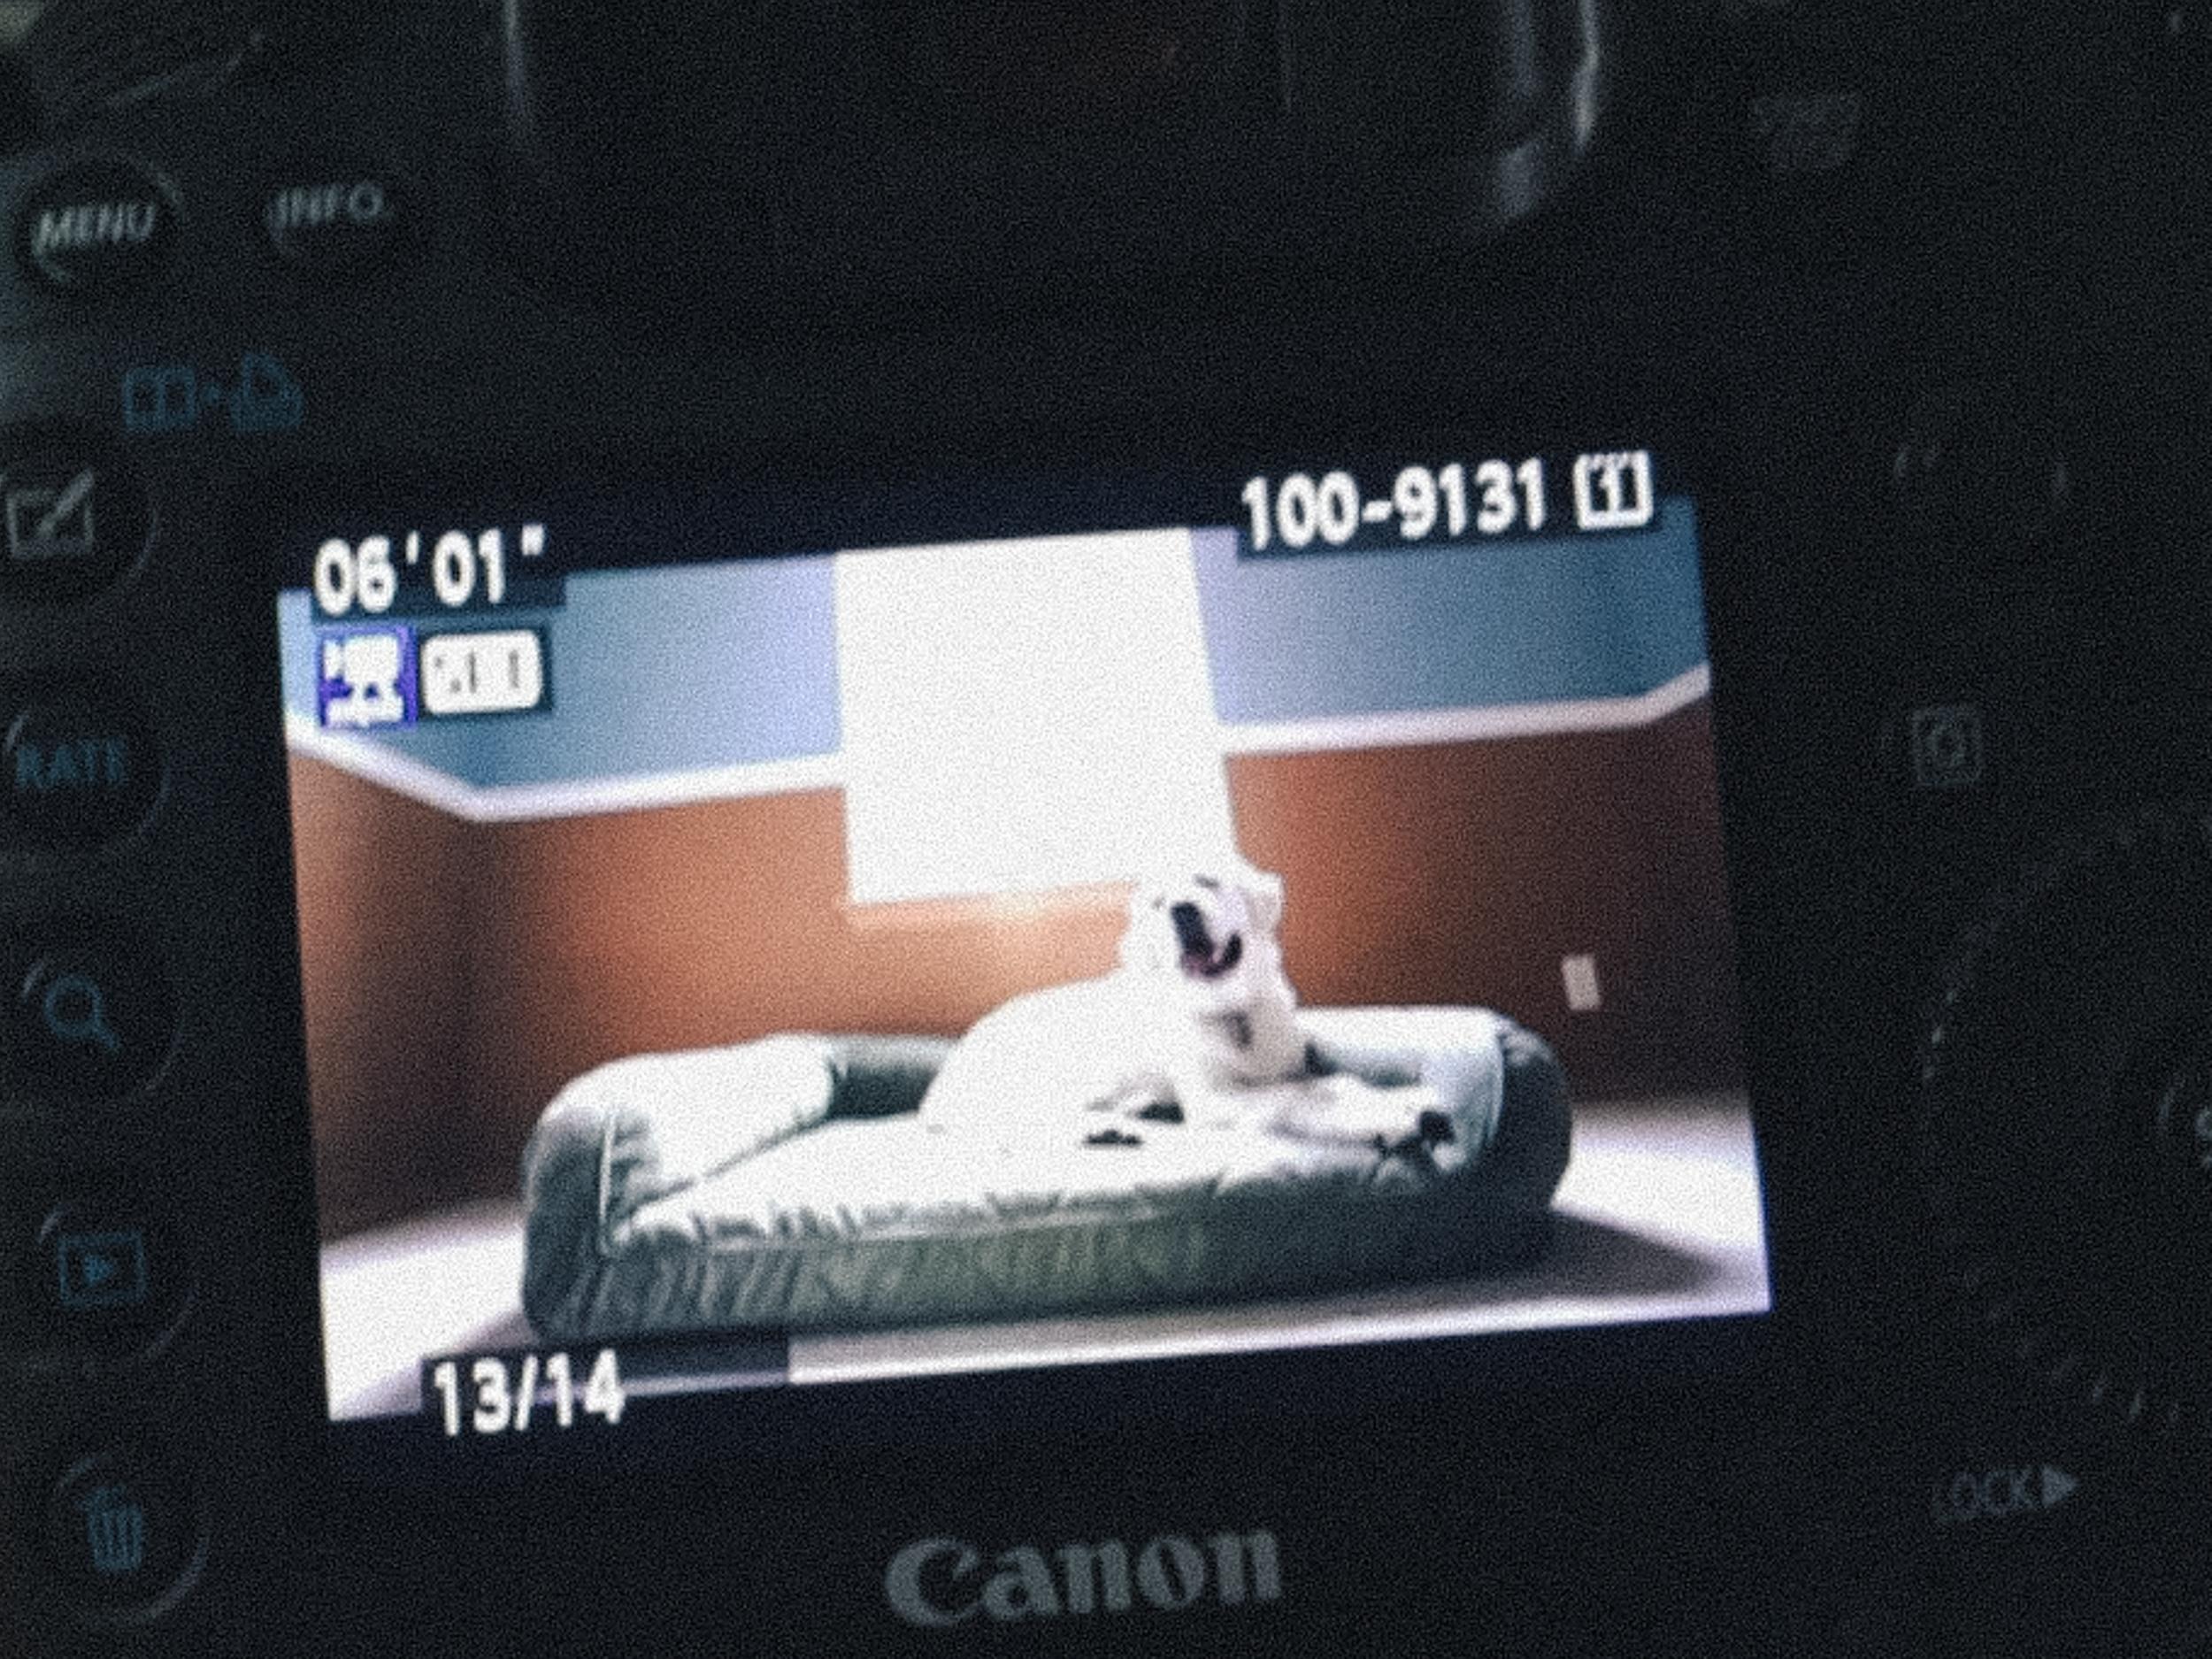 tempur-pedic dog bed